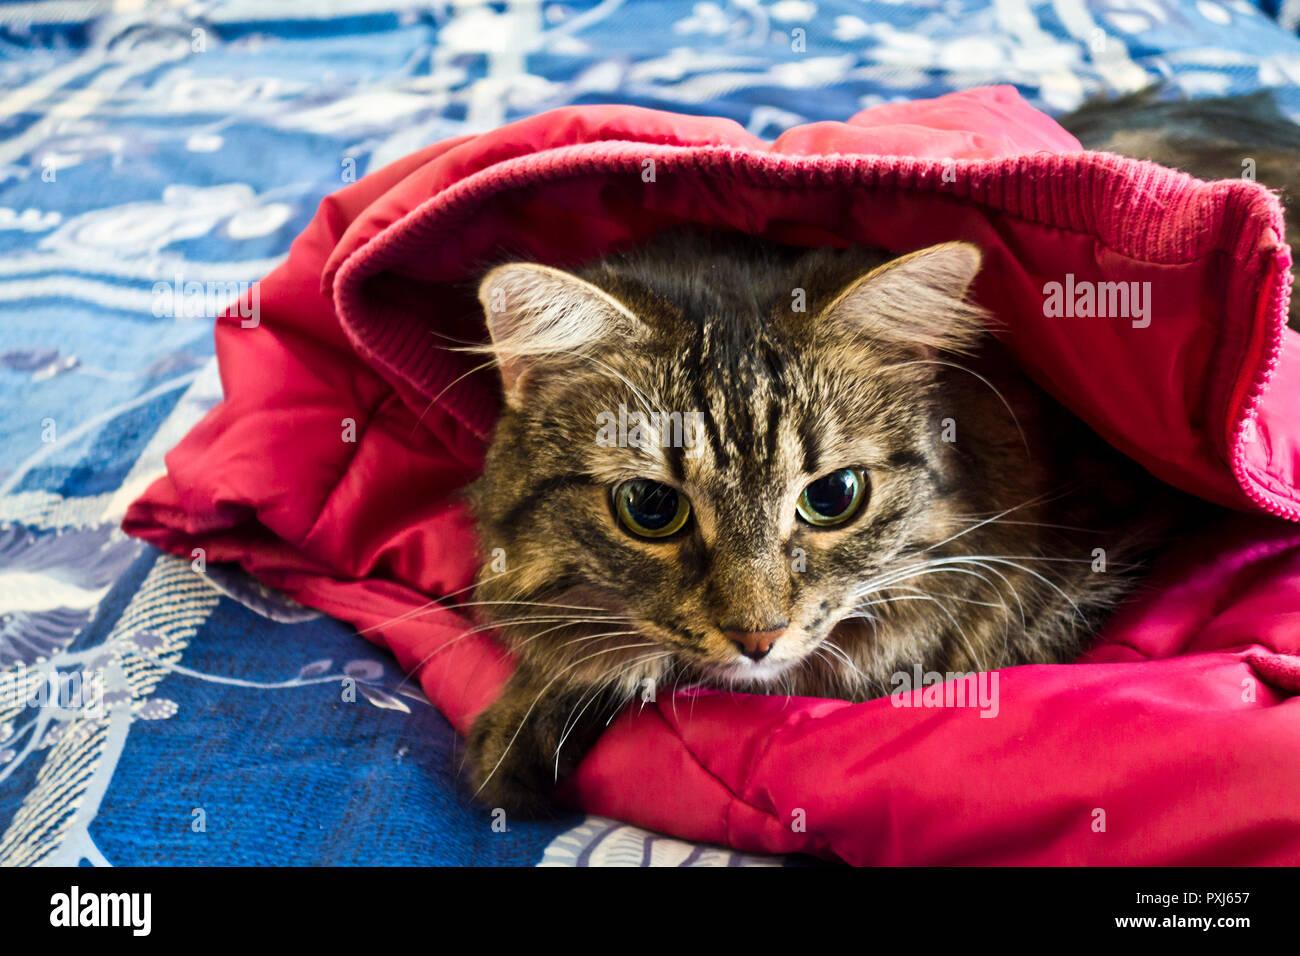 domestic crossbreed cat portrait - Stock Image